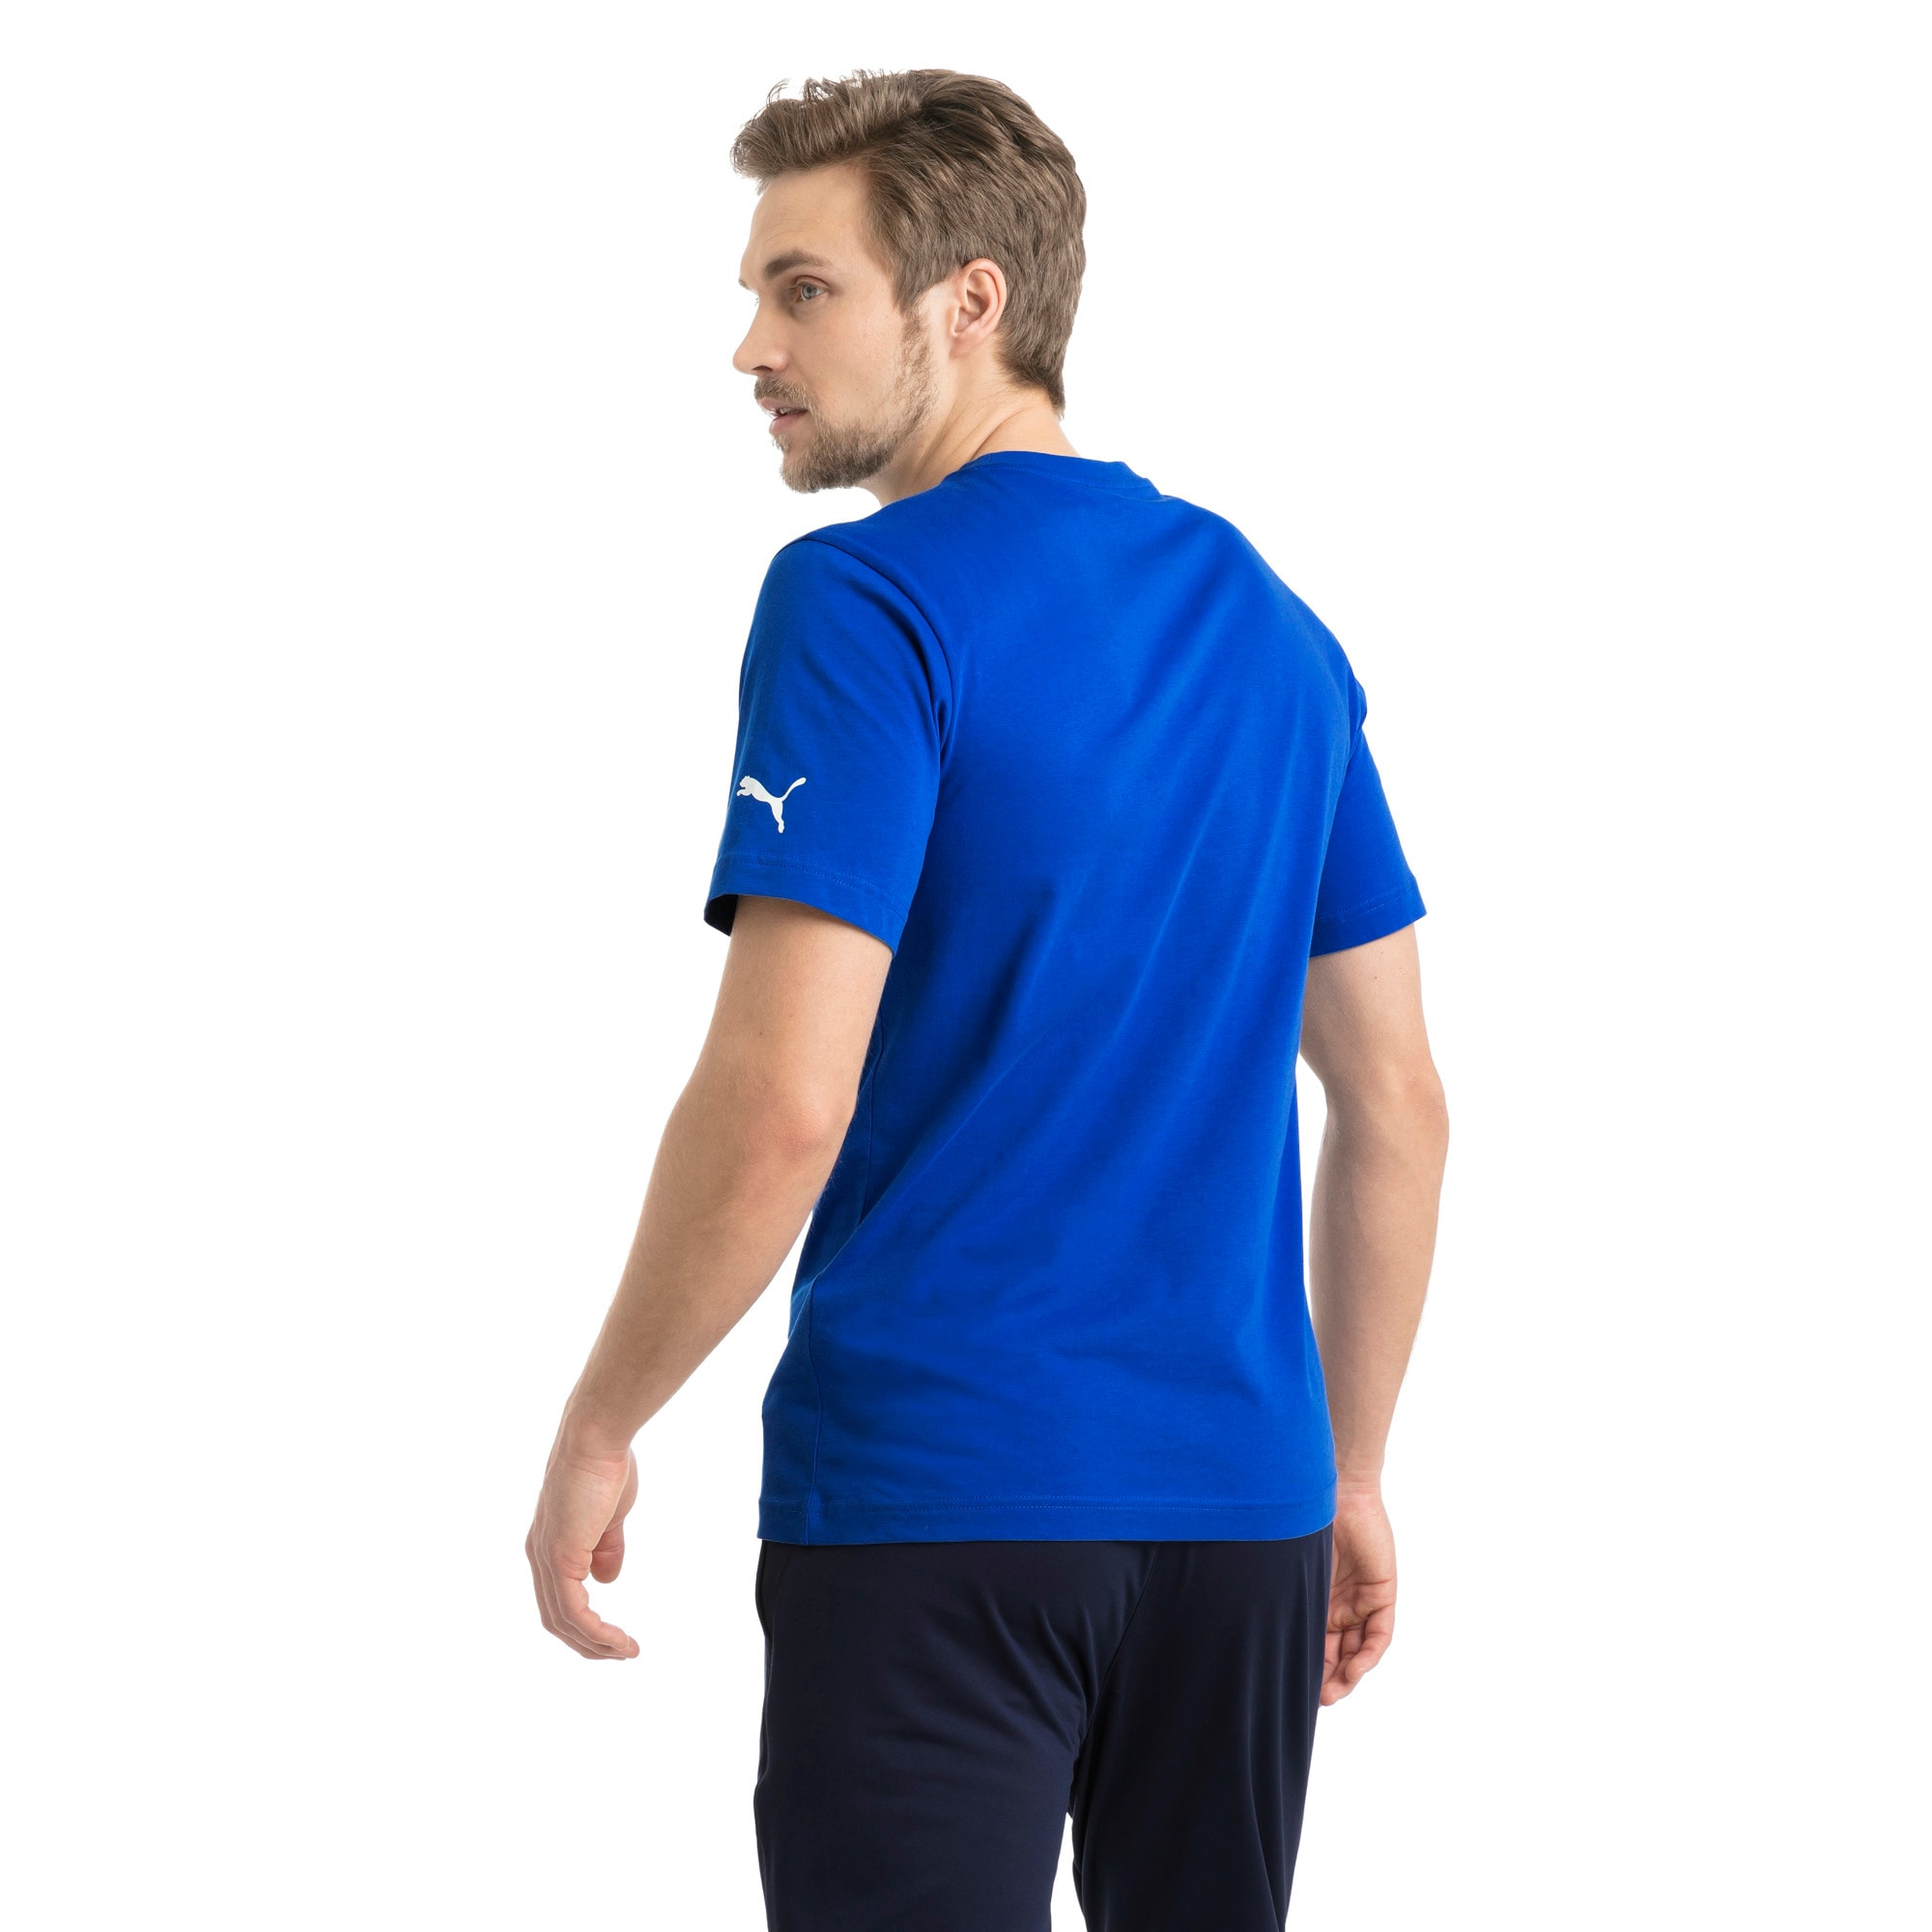 Thumbnail 3 of Italia Wappen T-Shirt, Team Power Blue, medium